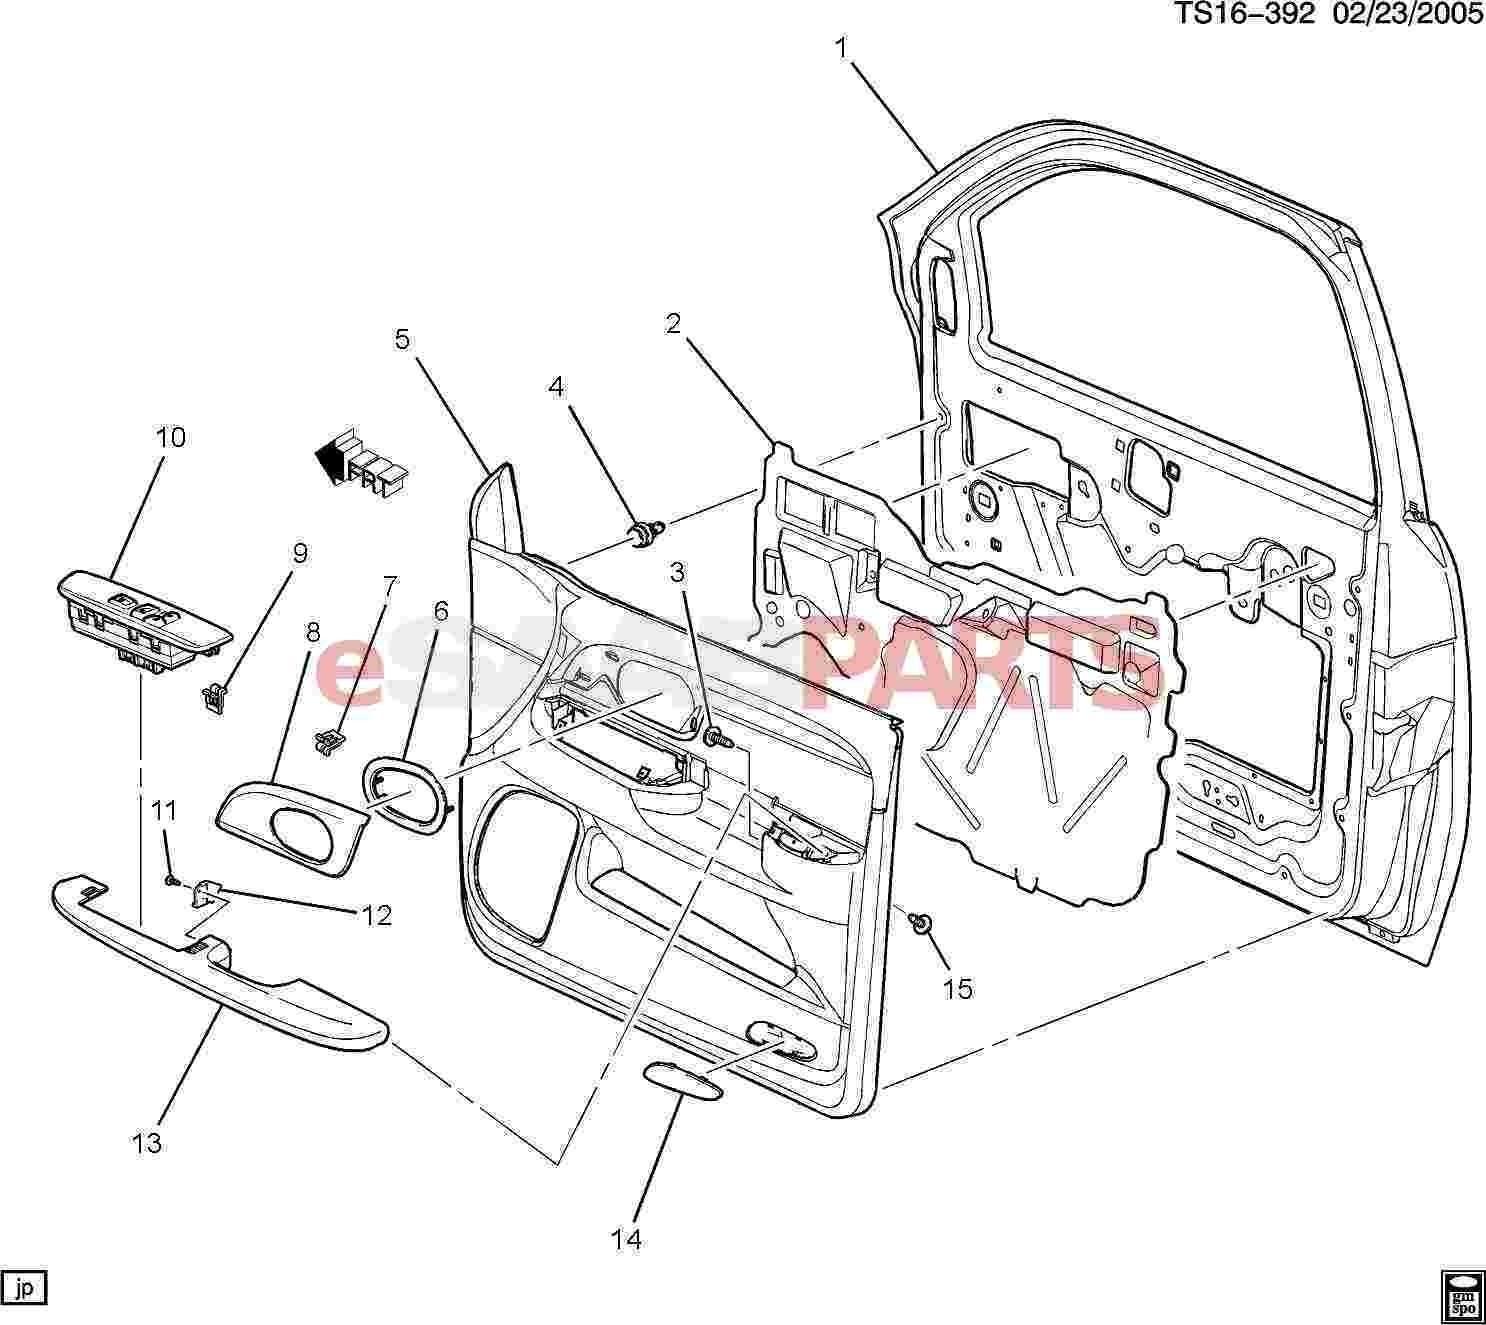 Car Parts Diagram Suspension Diagram Parts Under A Car Diagram Car Engine Parts ] Saab Bolt Of Car Parts Diagram Suspension